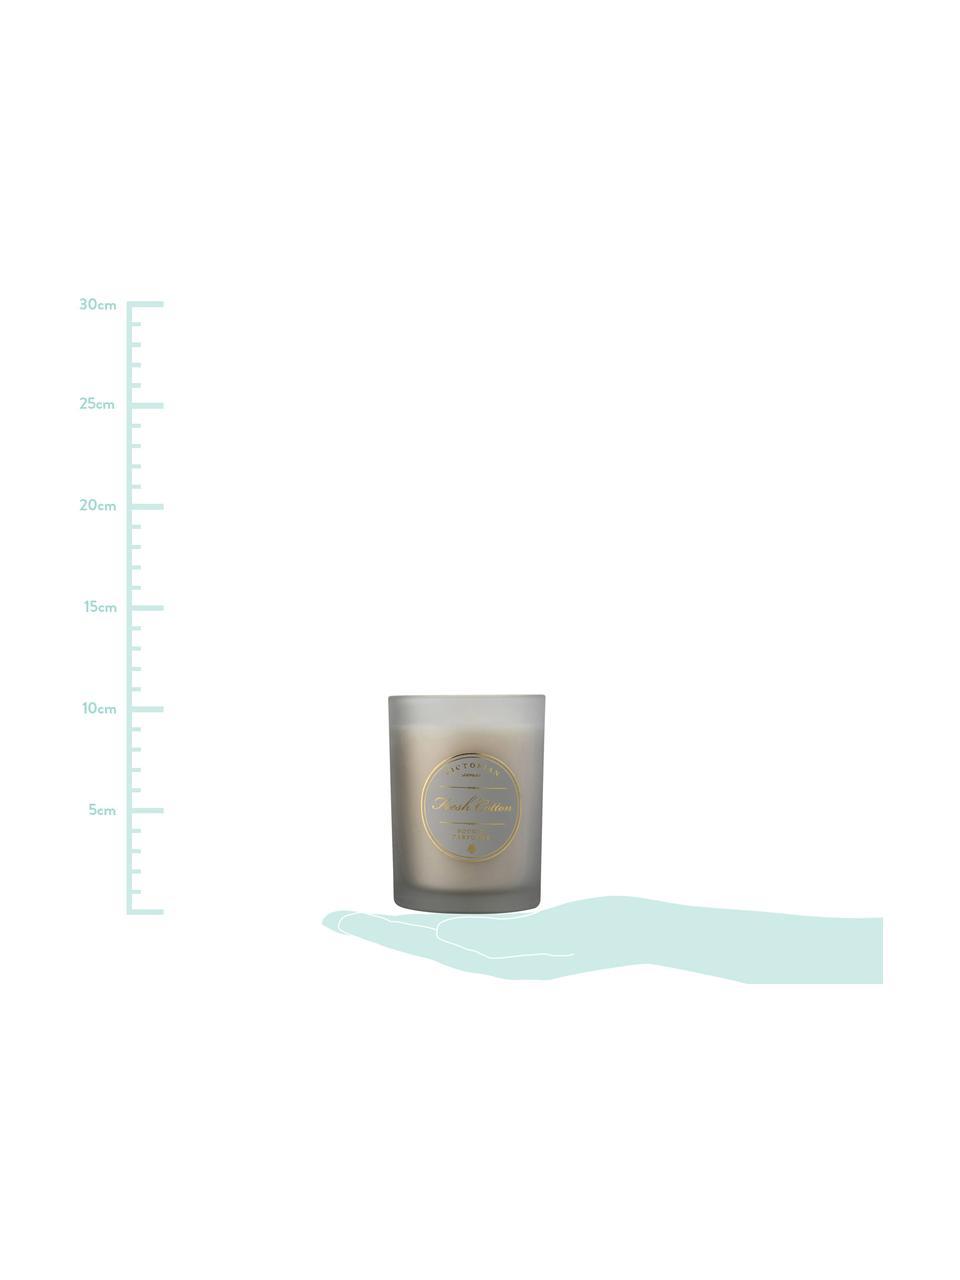 Geurkaars Sense (fris katoen), Houder: glas, Houder: grijs. Was: wit, Ø 9 x H 11 cm